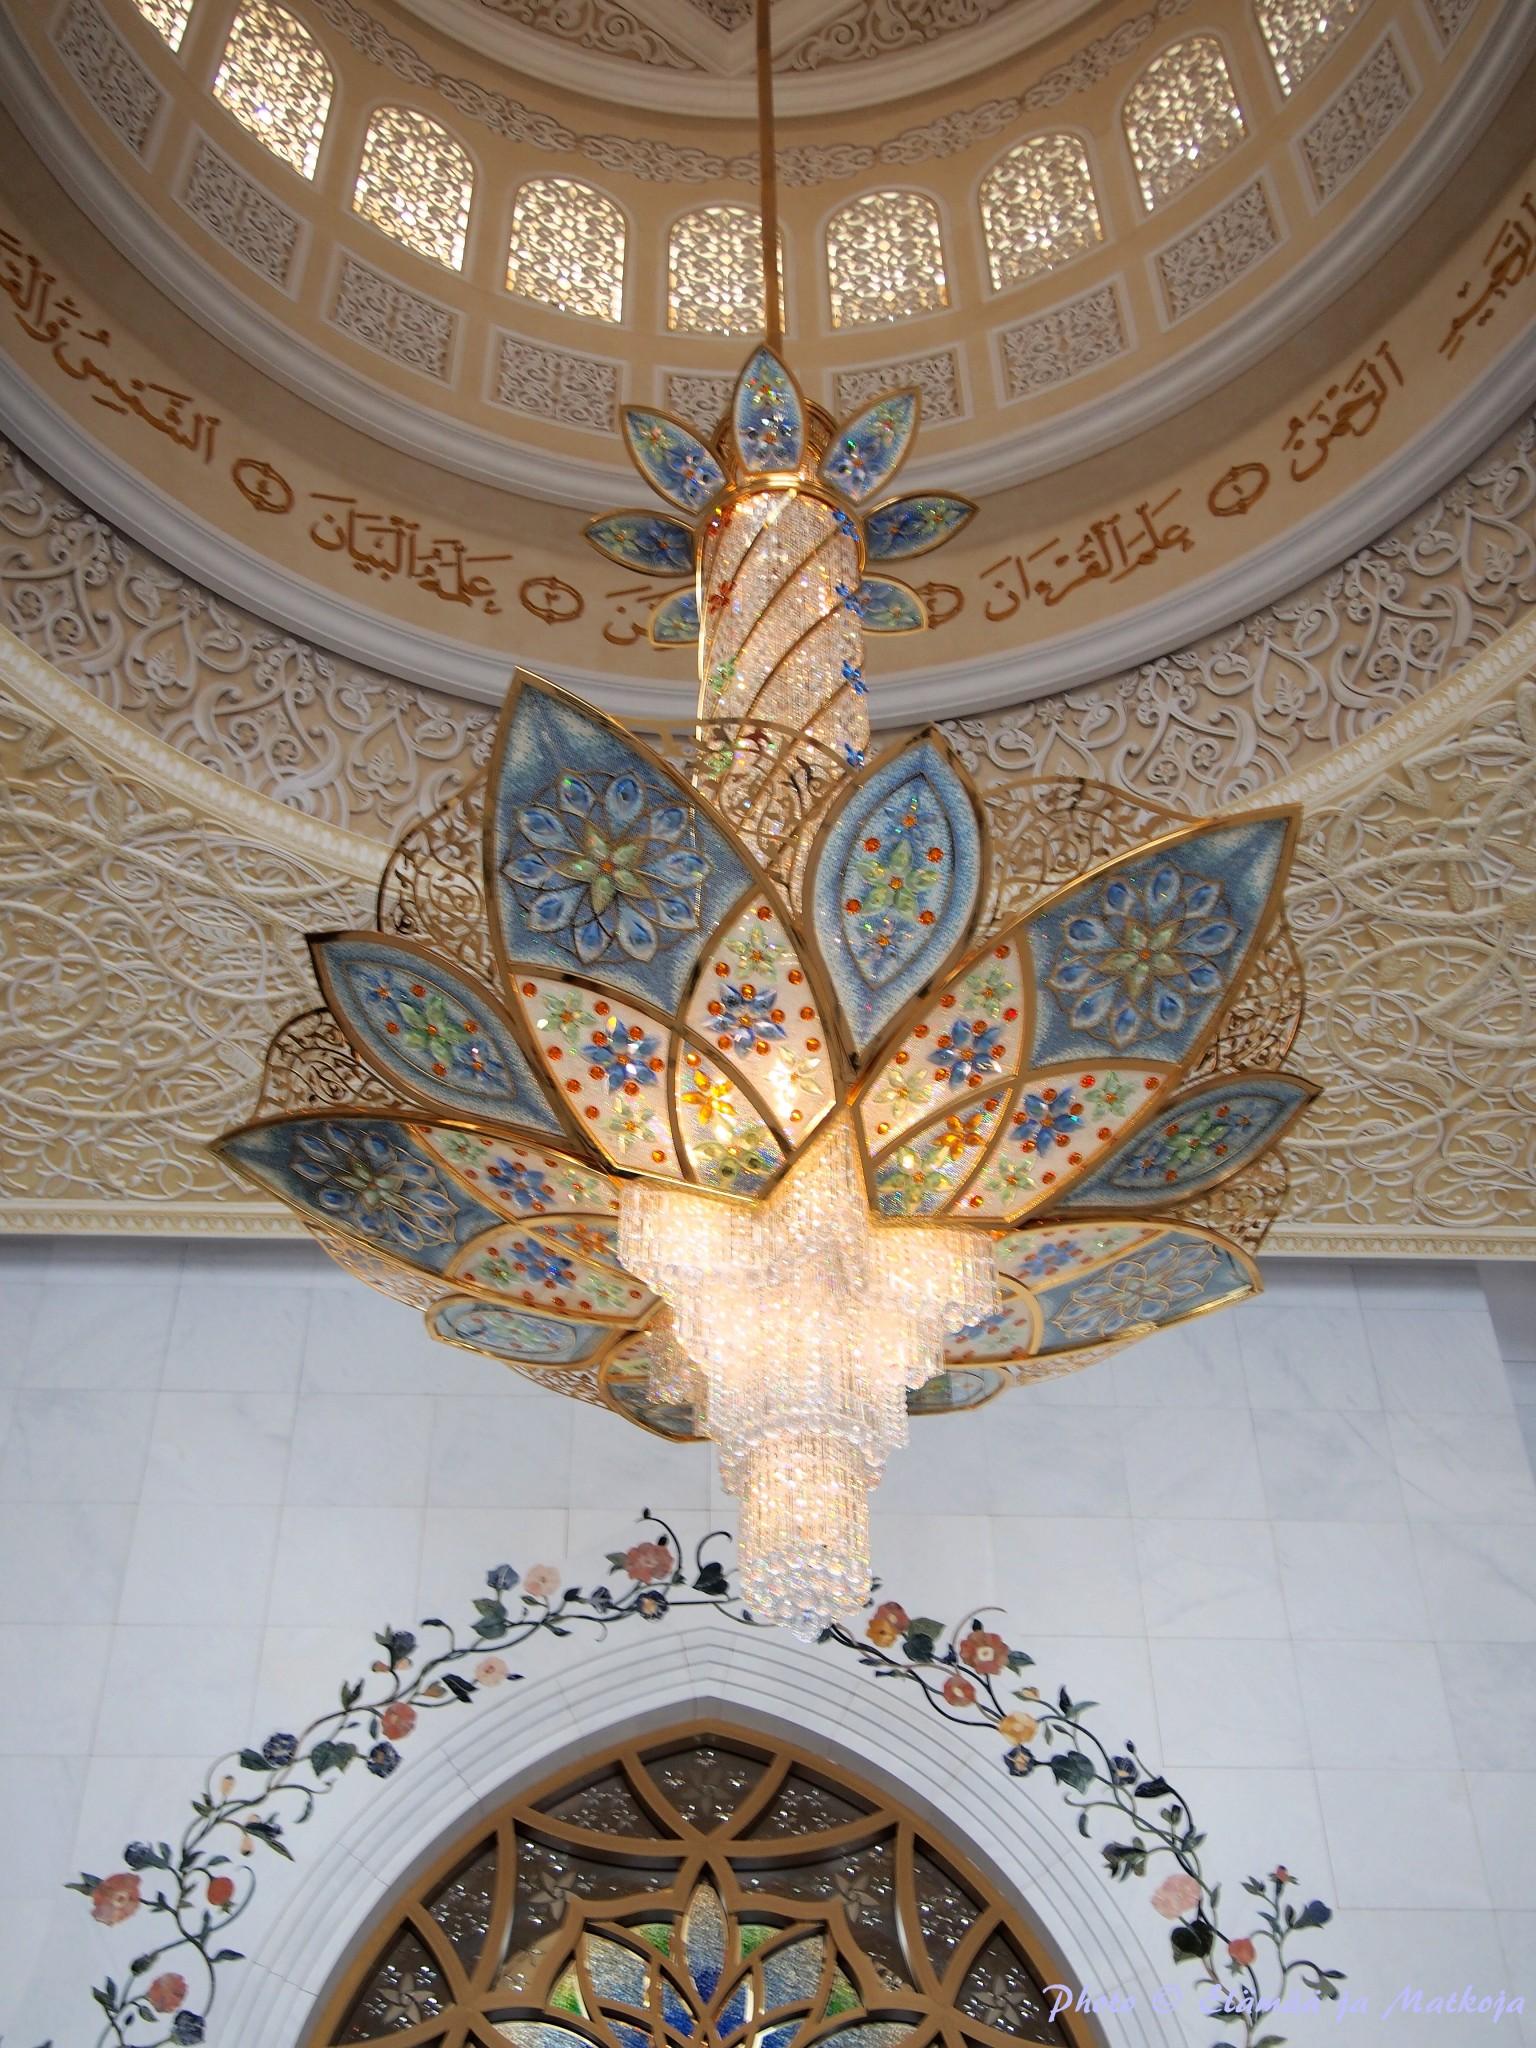 Sheikh Zayed Grand Mosque Abu Dhabi UAE 10 Photo © Elämää ja Matkoja